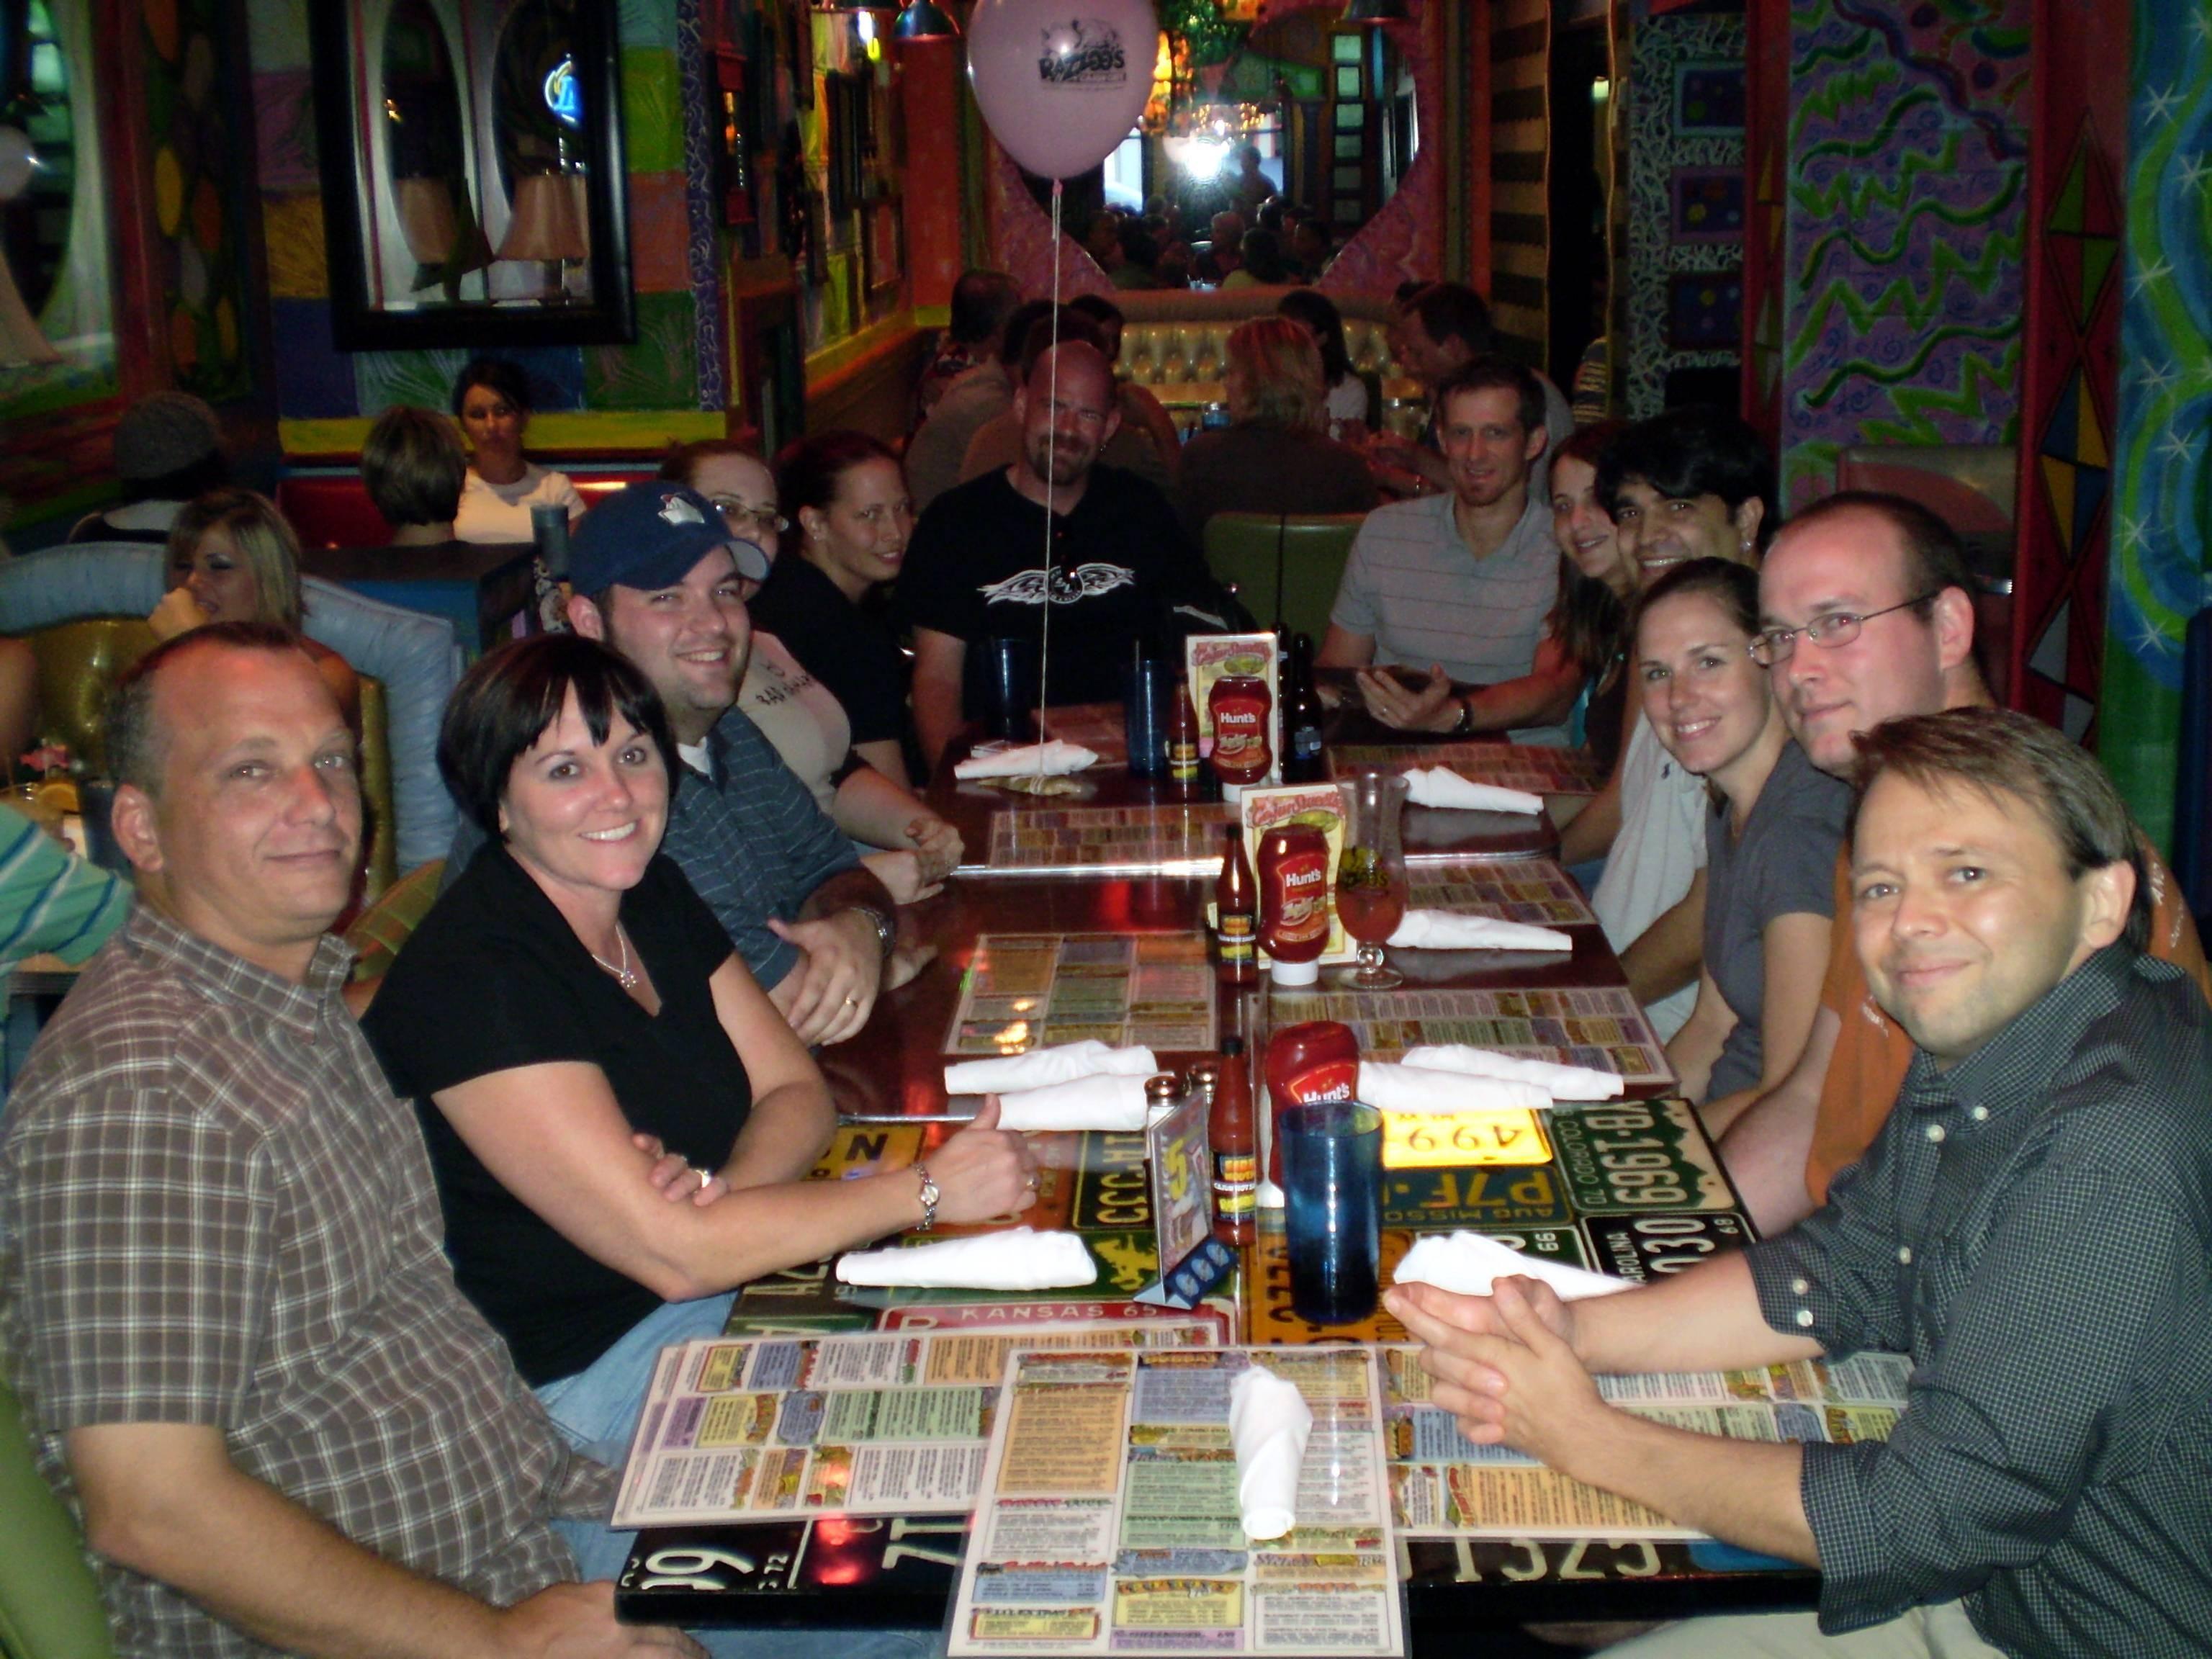 Dinner across Fort Worth: Red Robin Gourmet Burgers & Brews